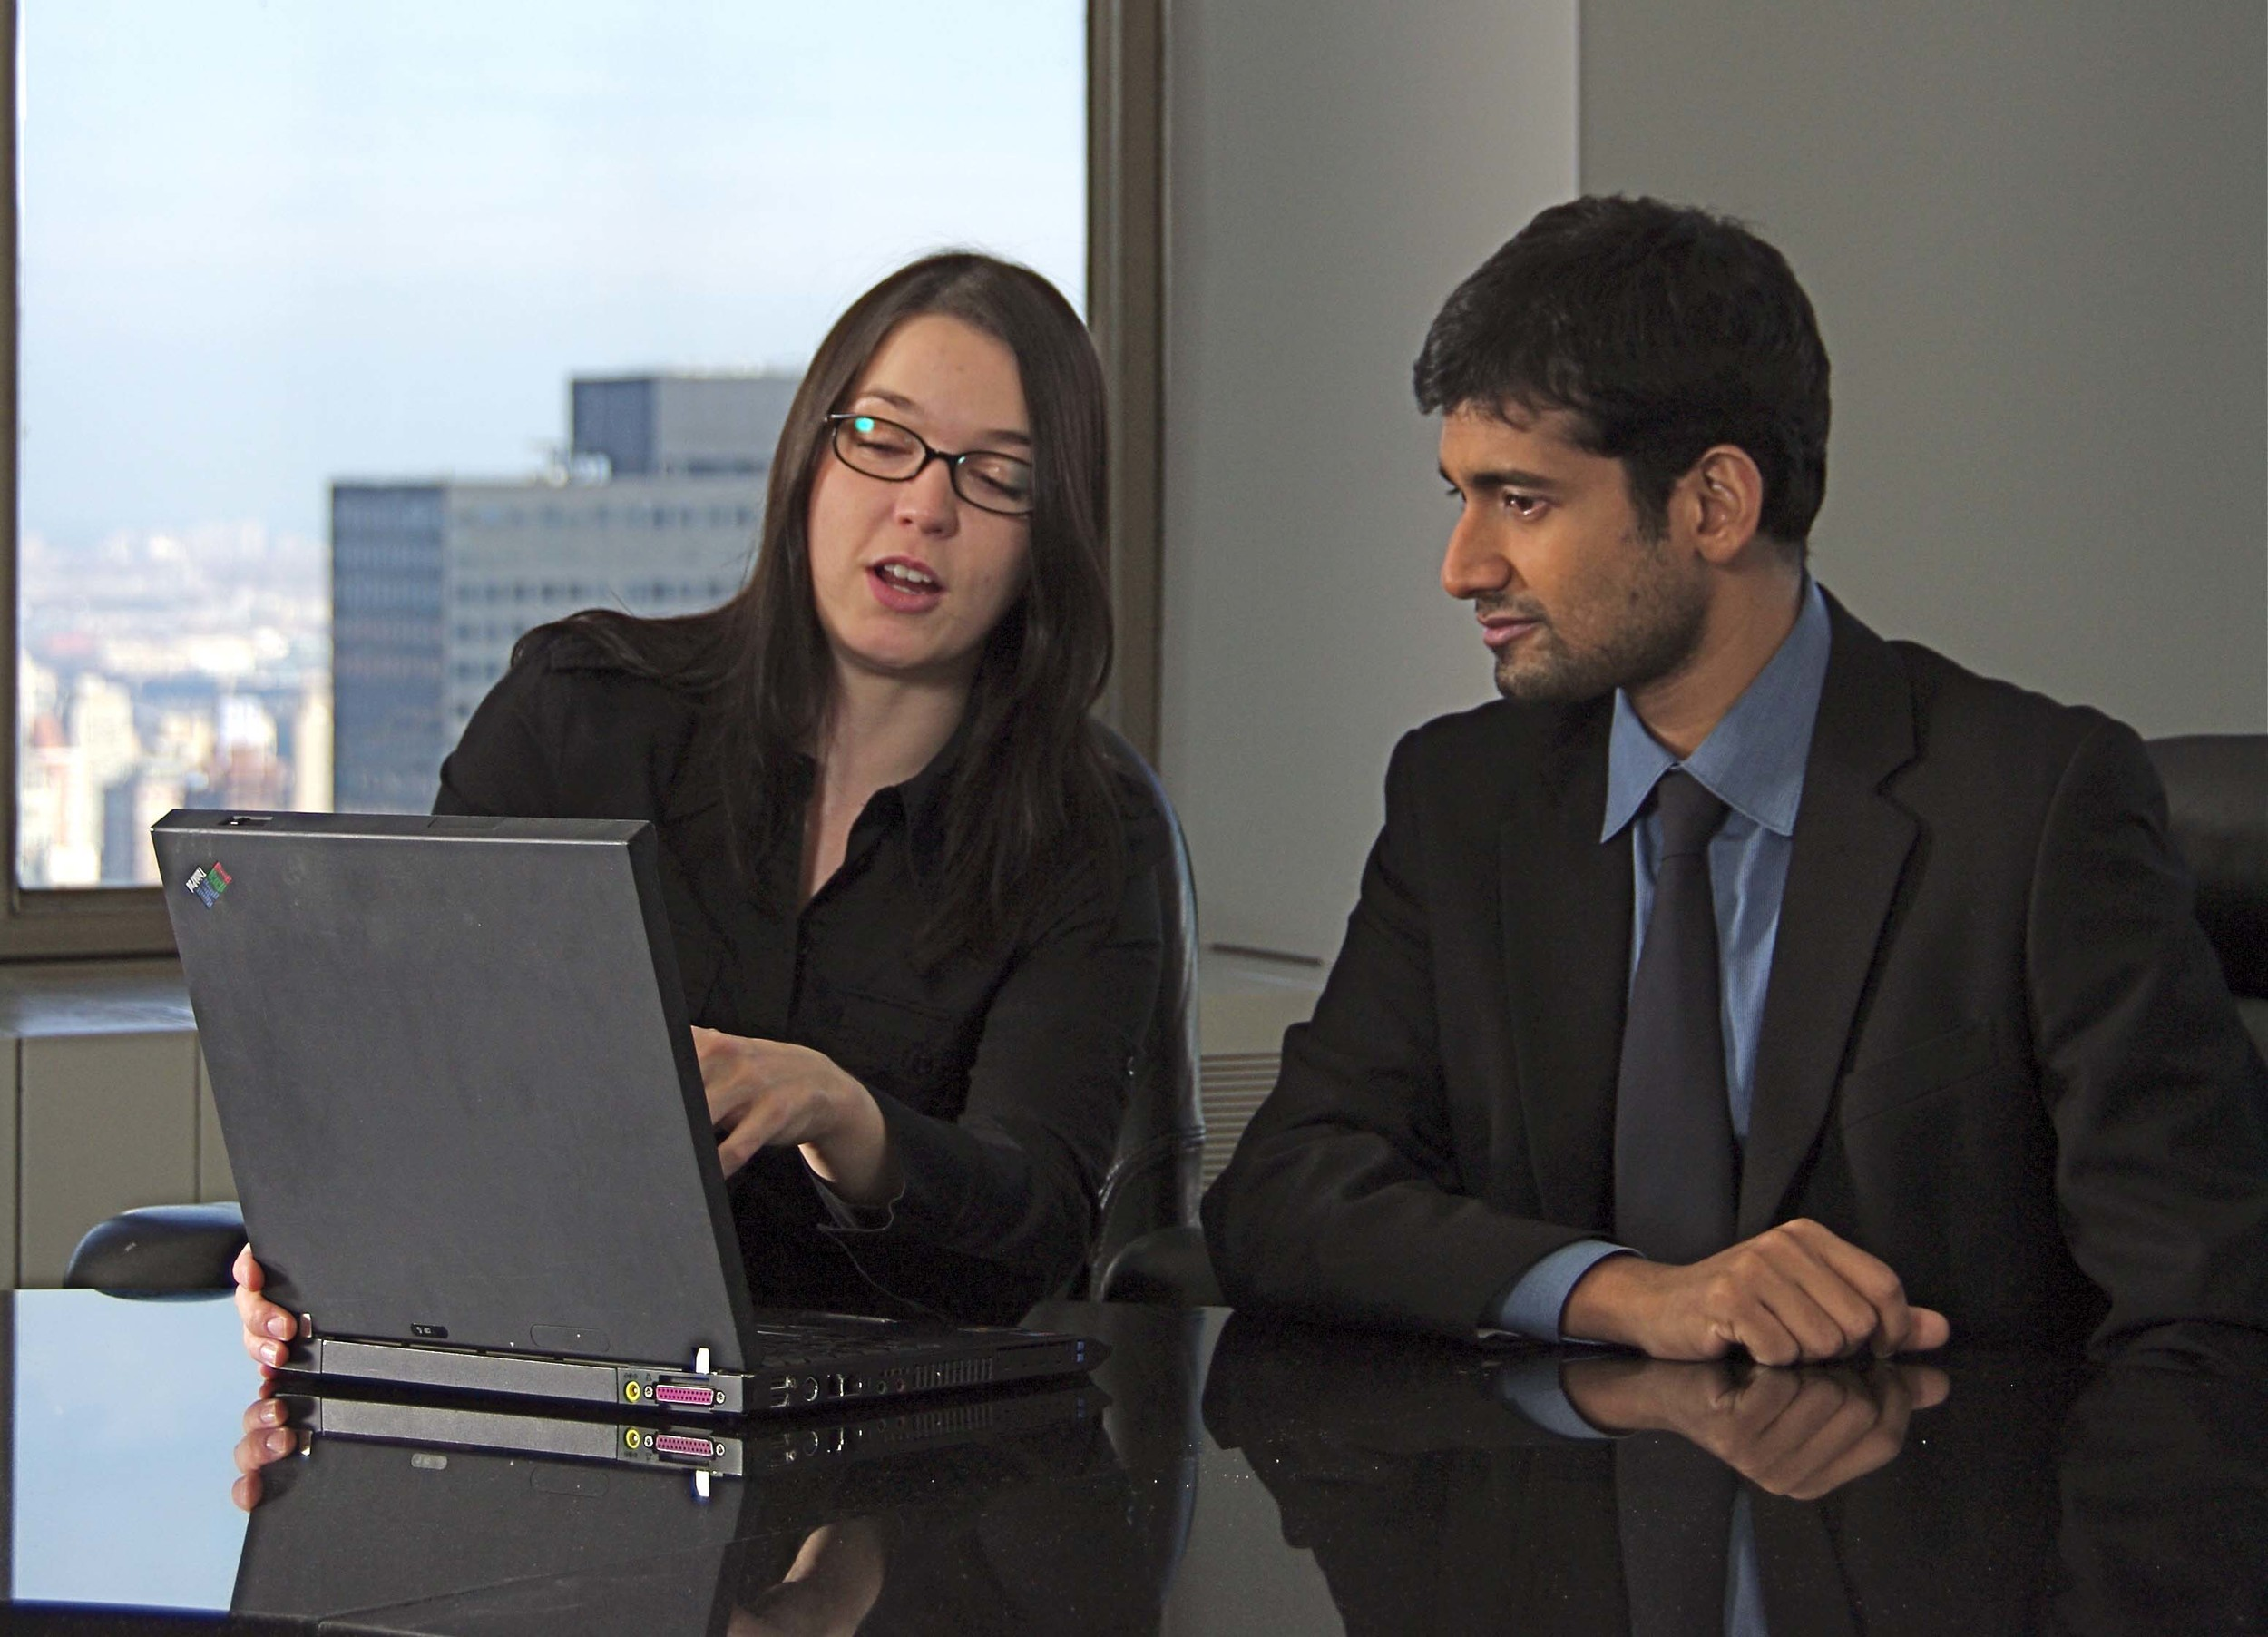 Two people looking at computer.jpg